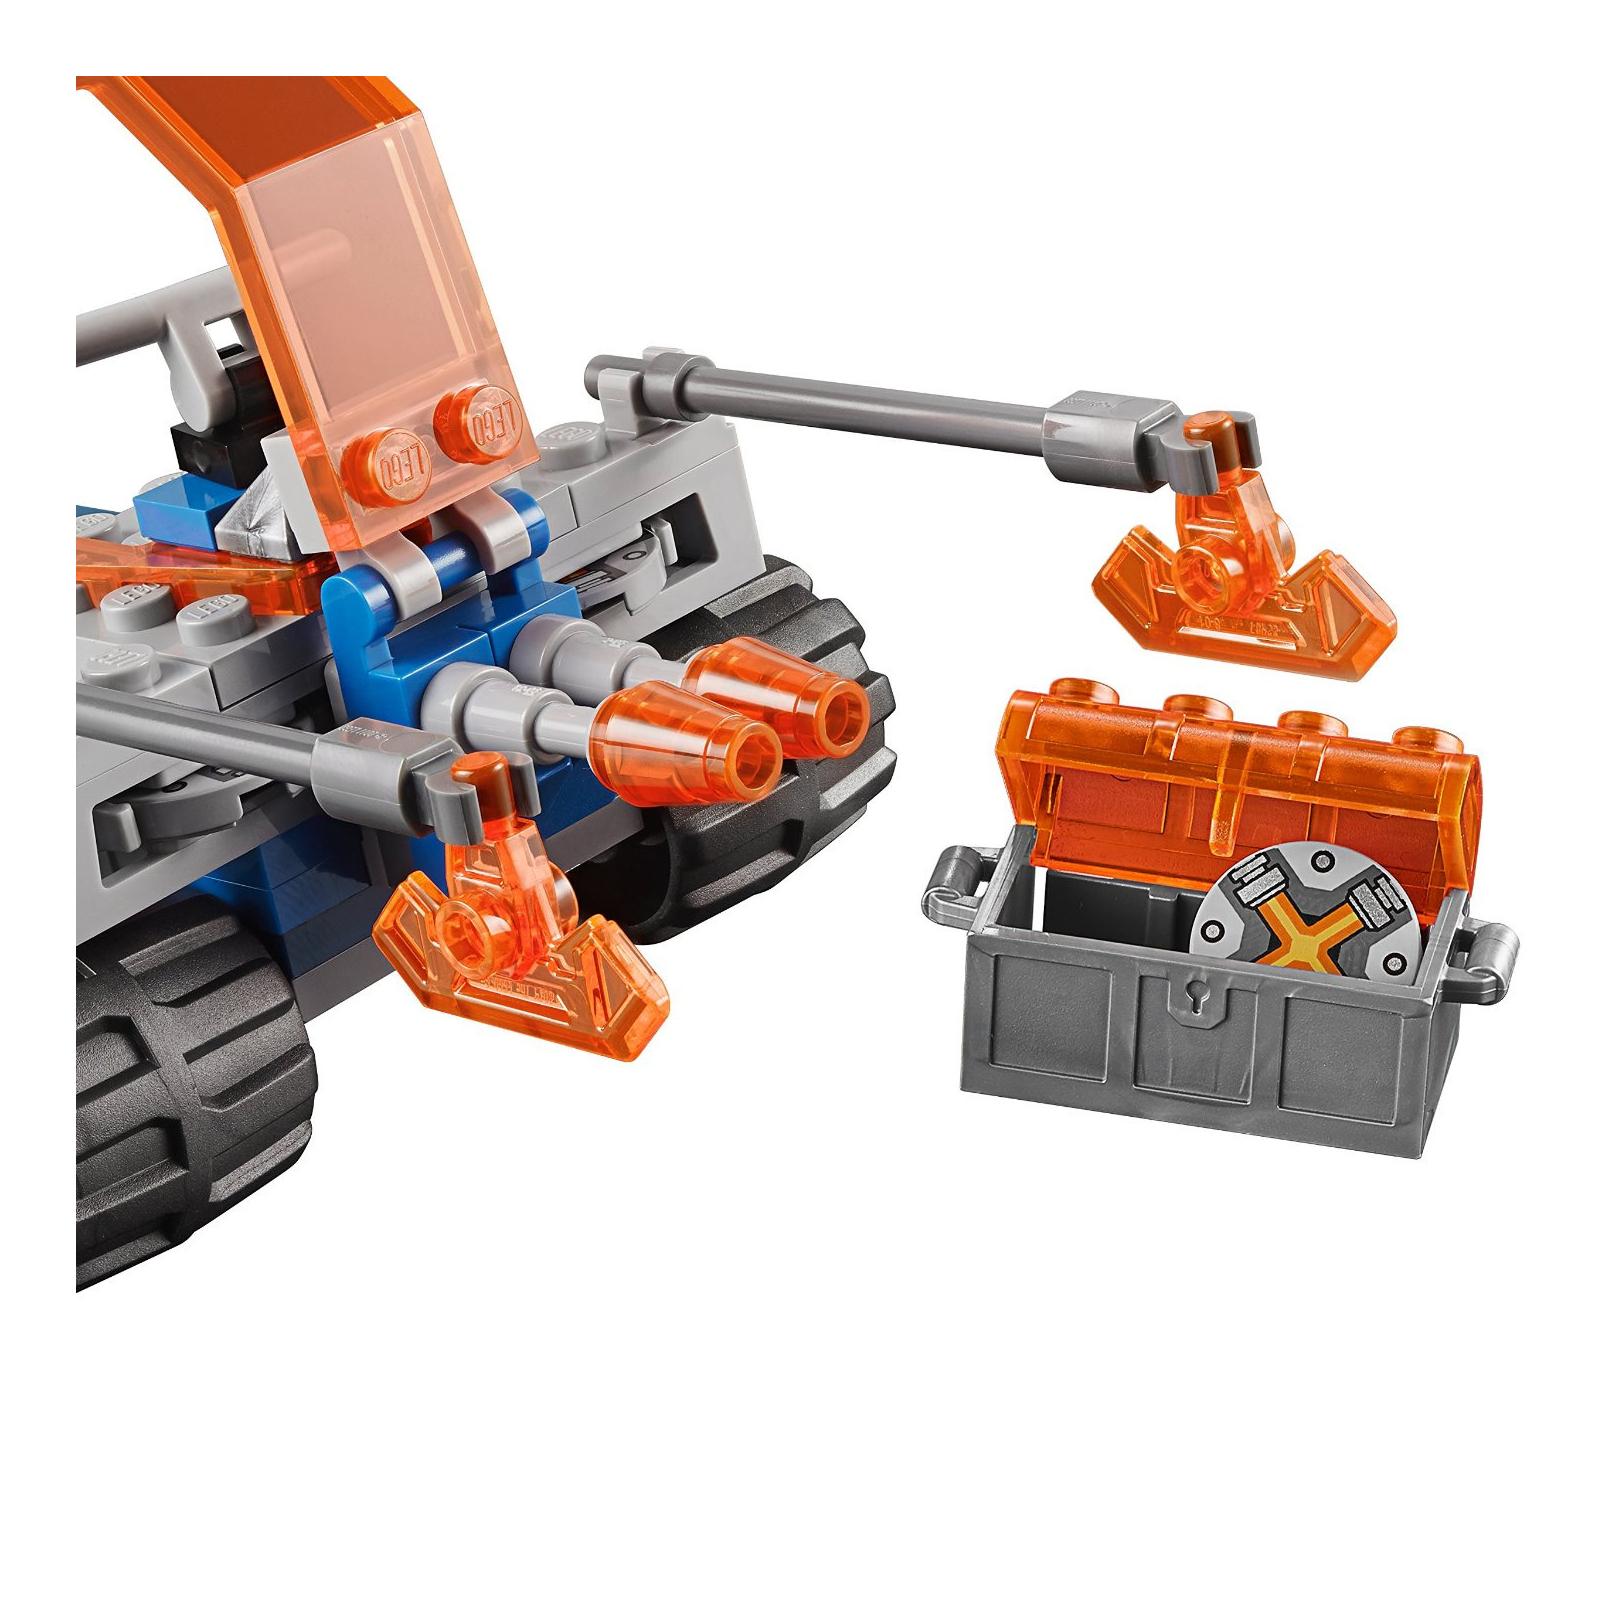 Конструктор LEGO Nexo Knights Королевский боевой бластер (70310) изображение 6